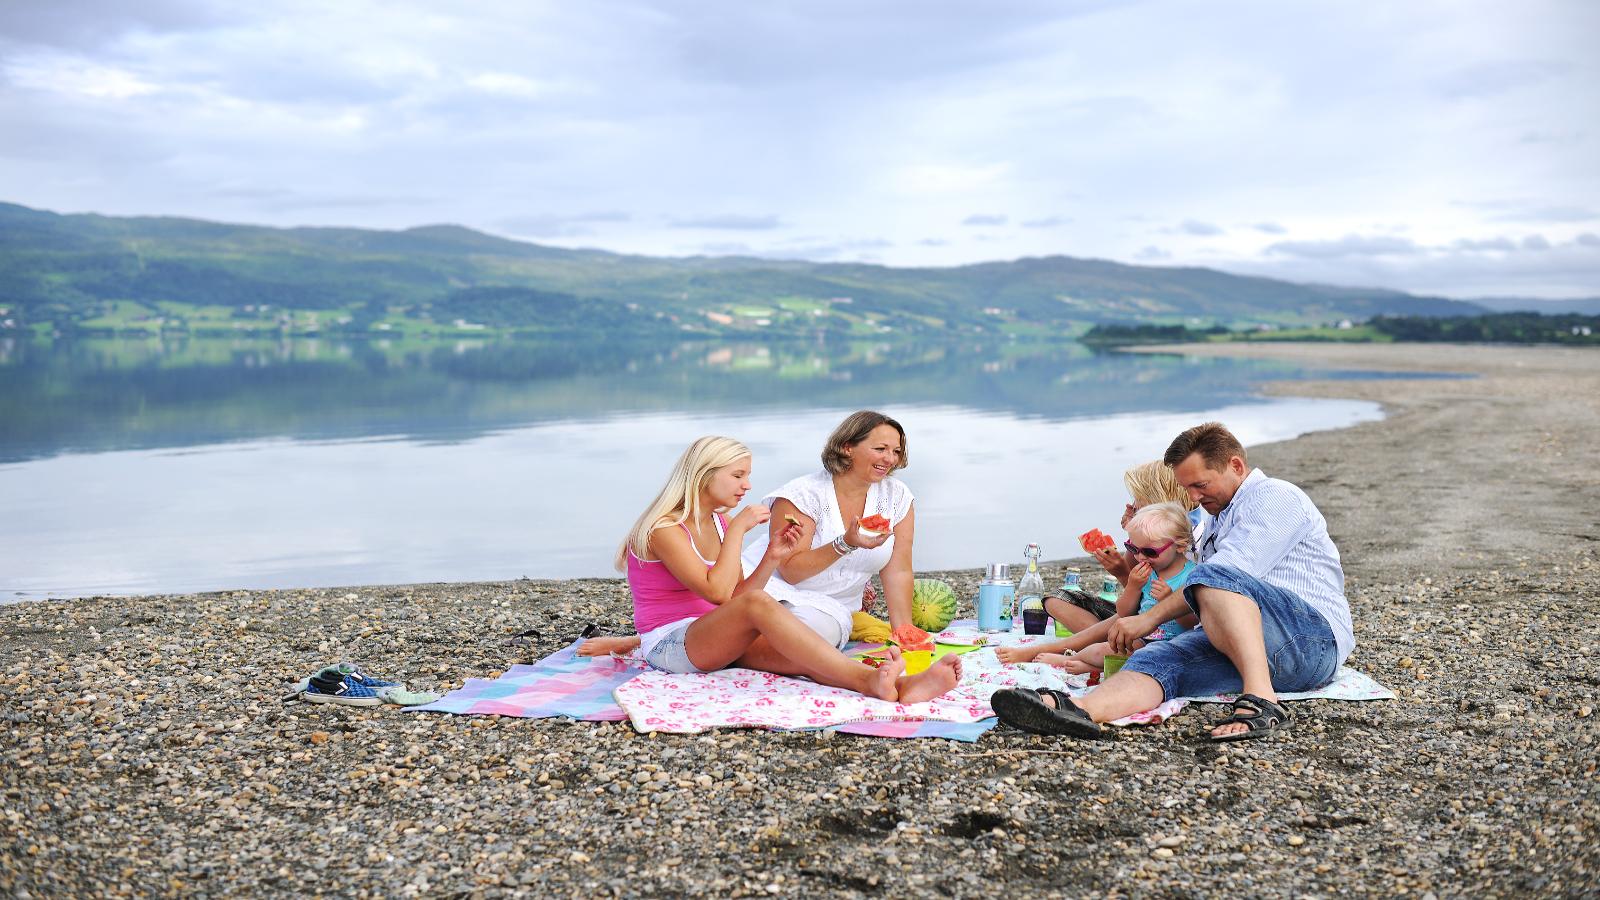 Piknik ved Selbusjøen. Foto: Marius Rua/trondelag.com